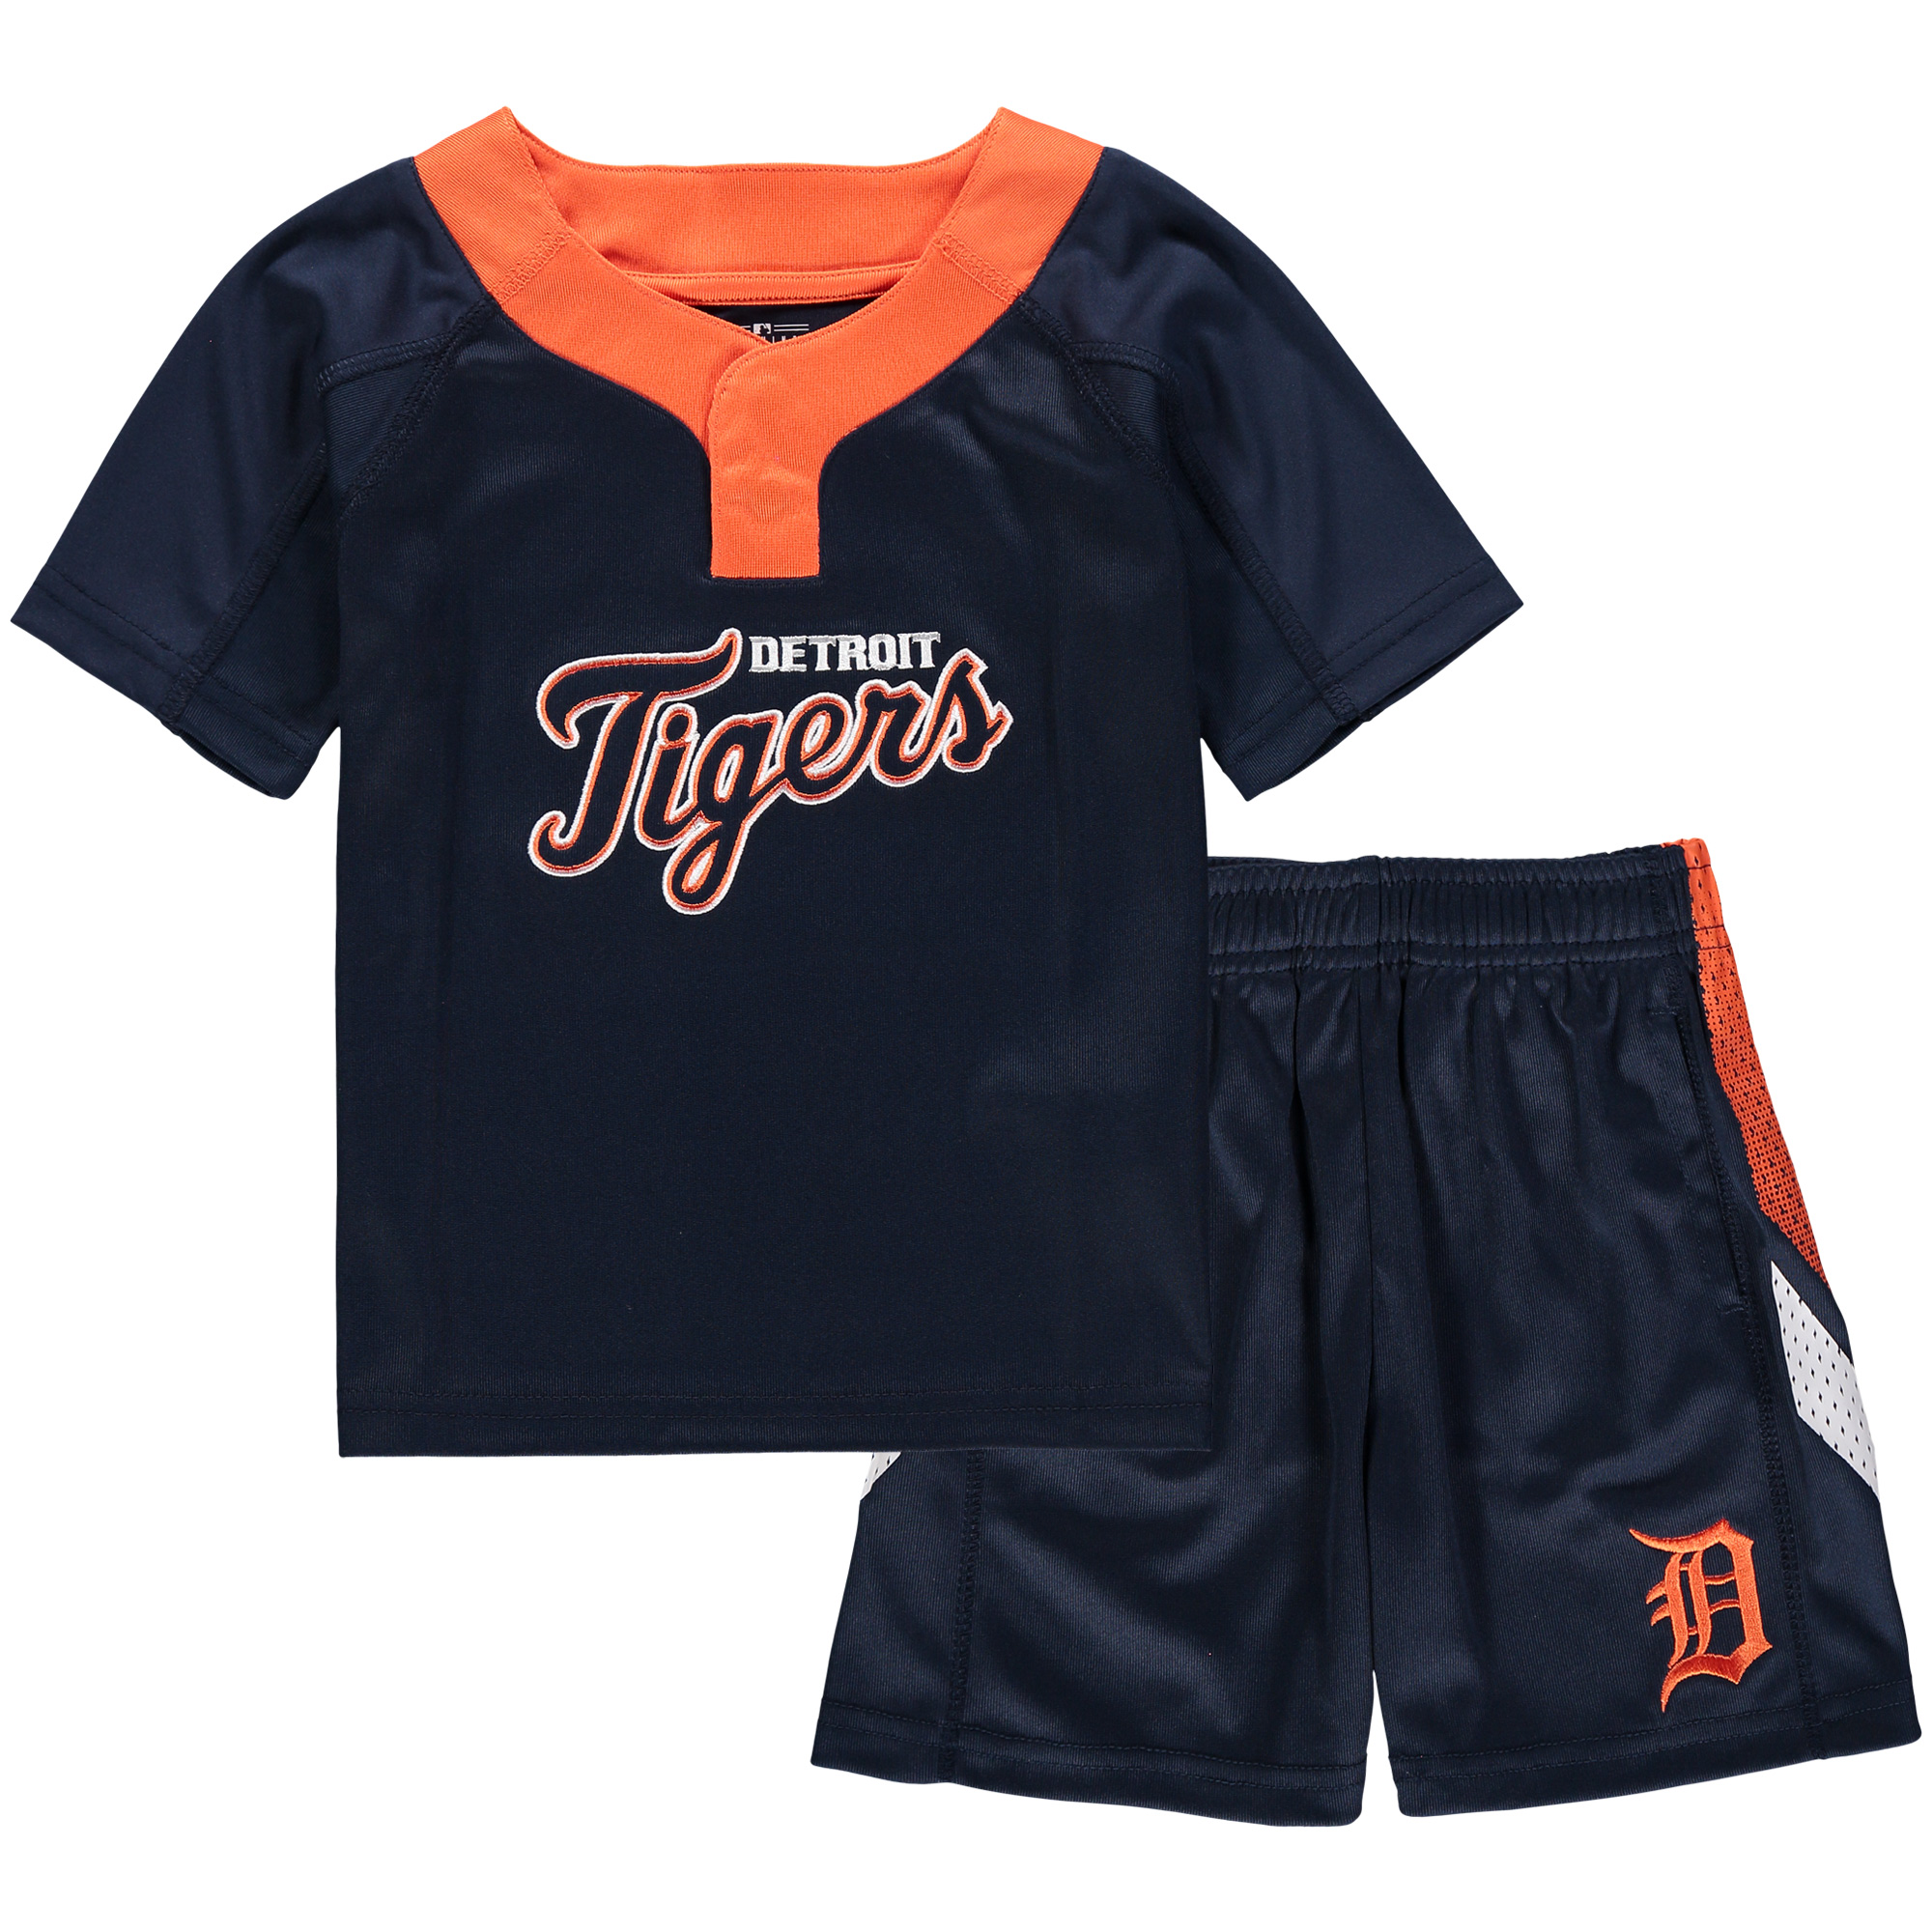 Detroit Tigers Toddler Ground Rules T-Shirt & Shorts Set - Navy/Orange